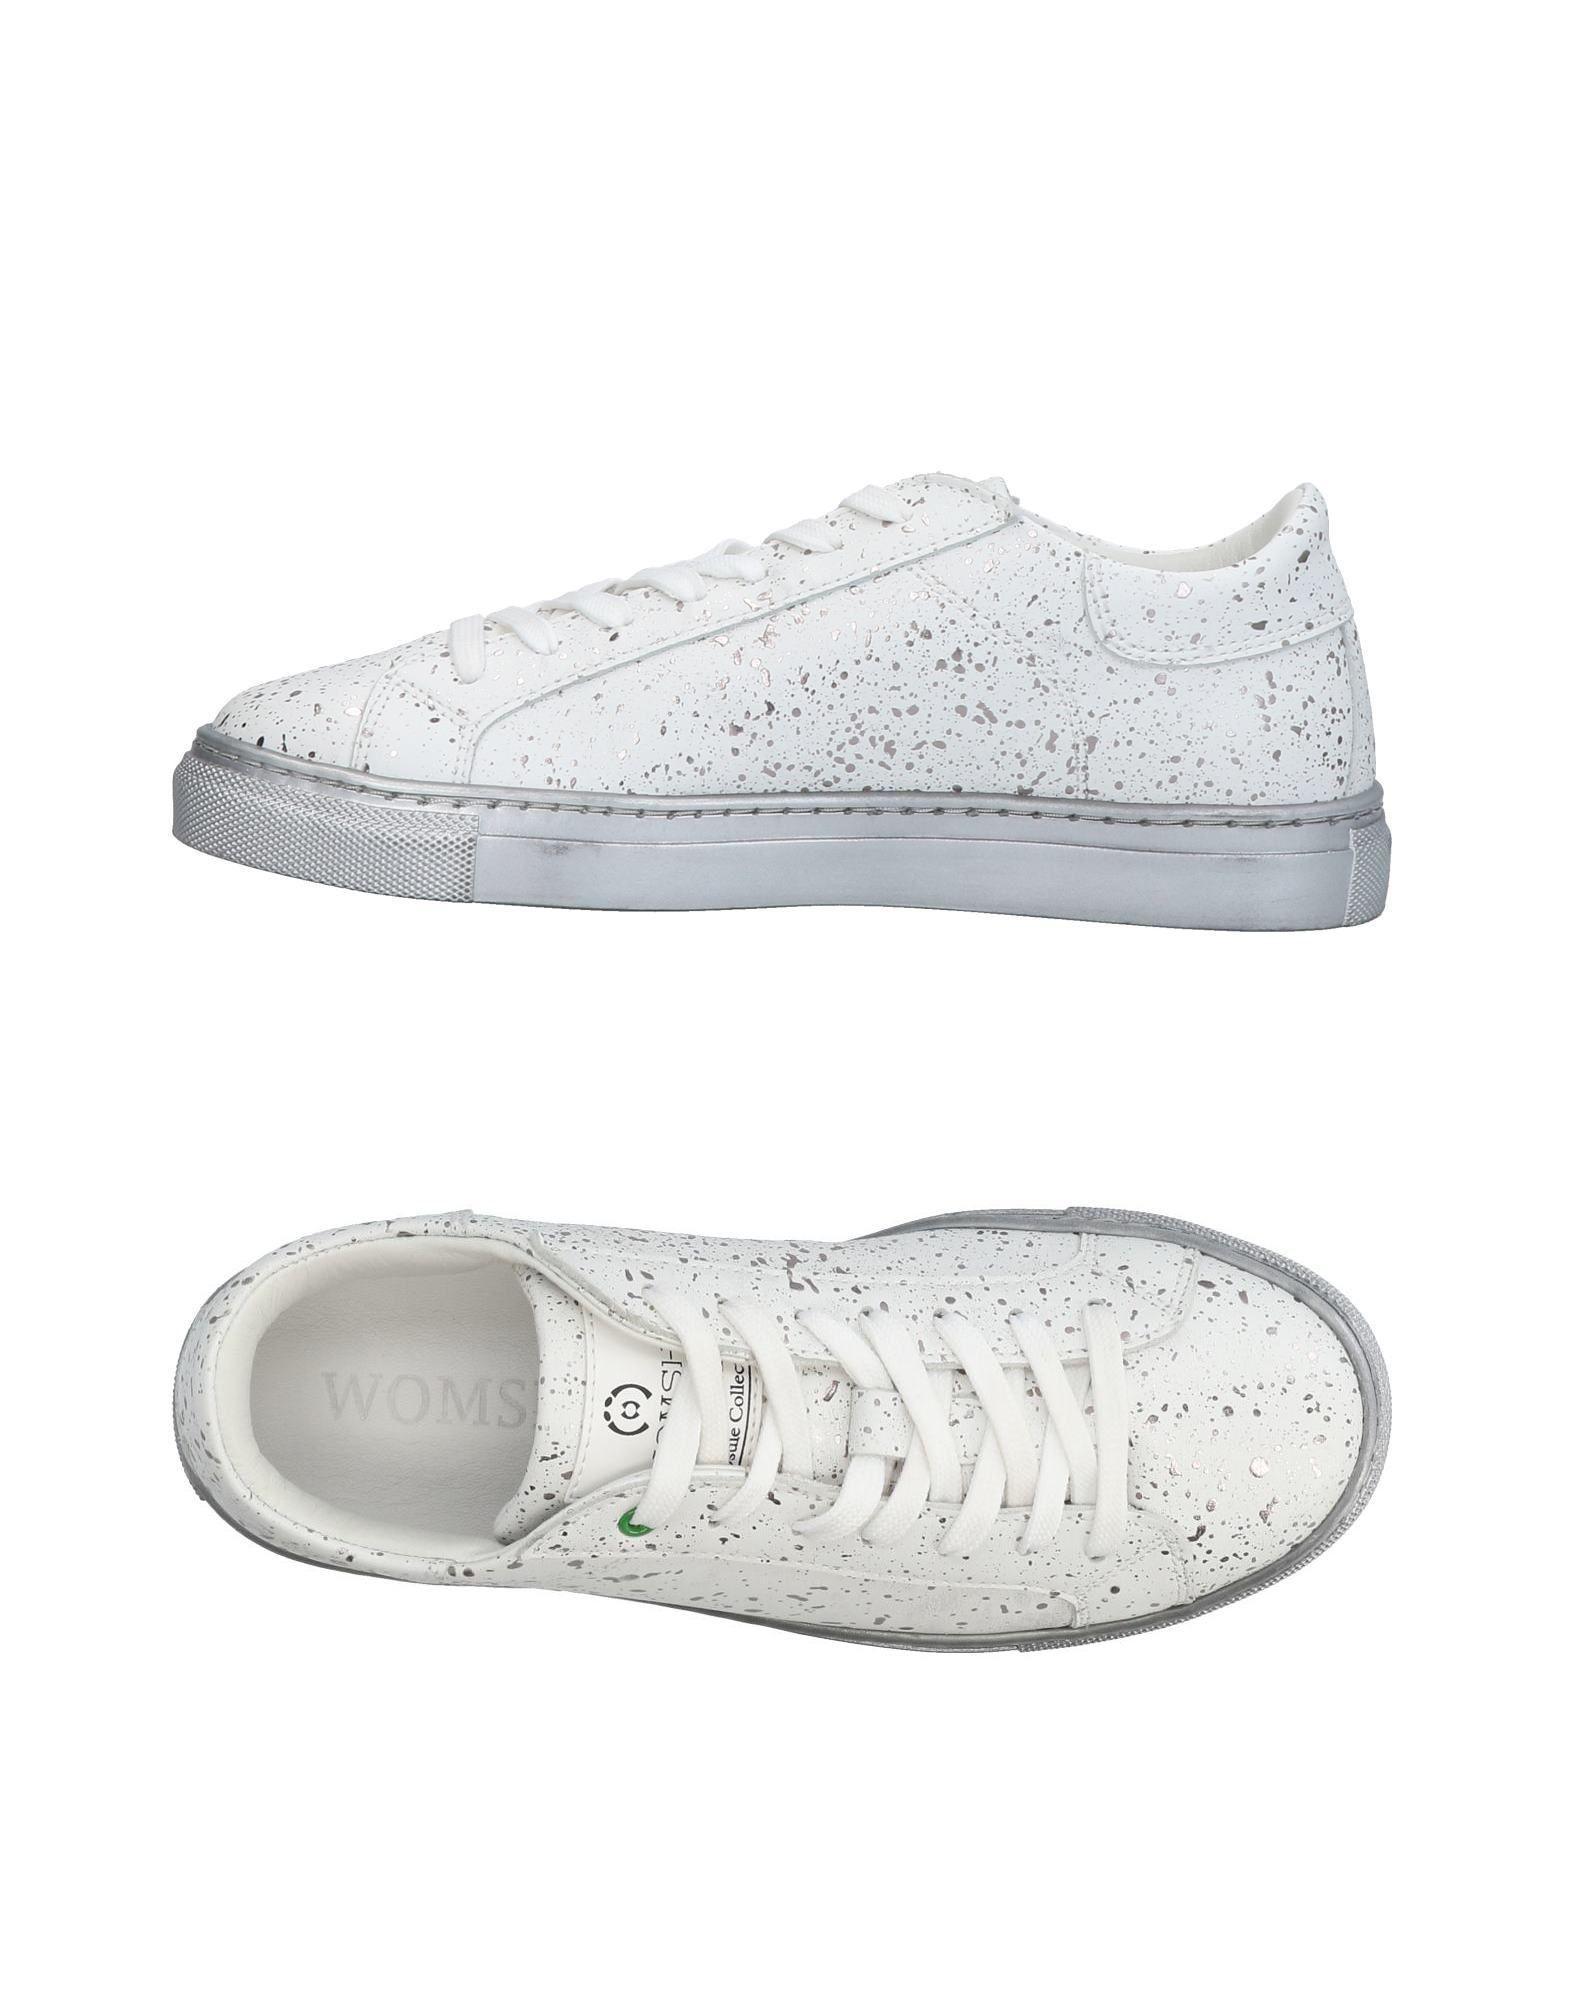 Chaussures - Bas-tops Et Baskets Womsh 1FttvXhkBL